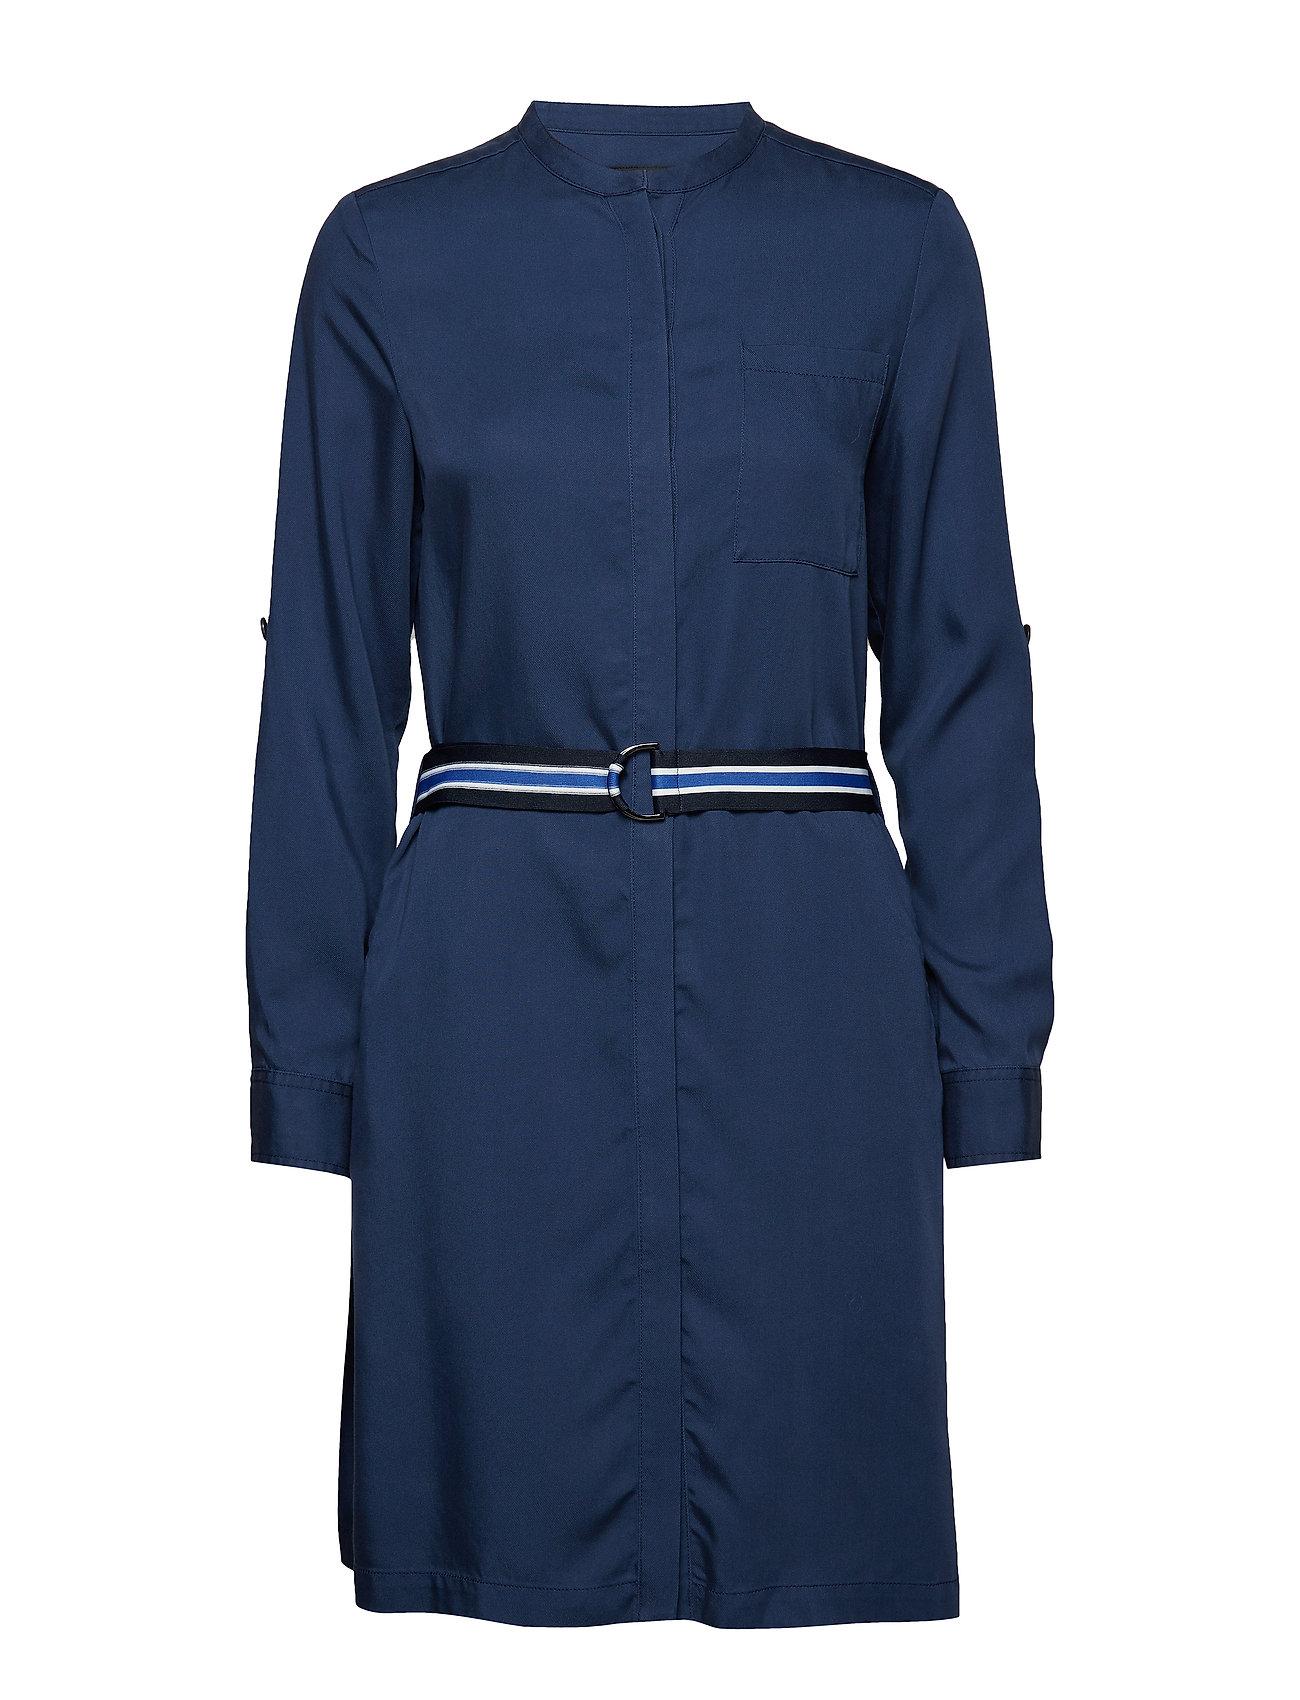 InkMarc Dresstinted InkMarc O'polo Dresstinted Dresstinted O'polo Dresstinted O'polo InkMarc O'polo InkMarc Dresstinted pVSUzM